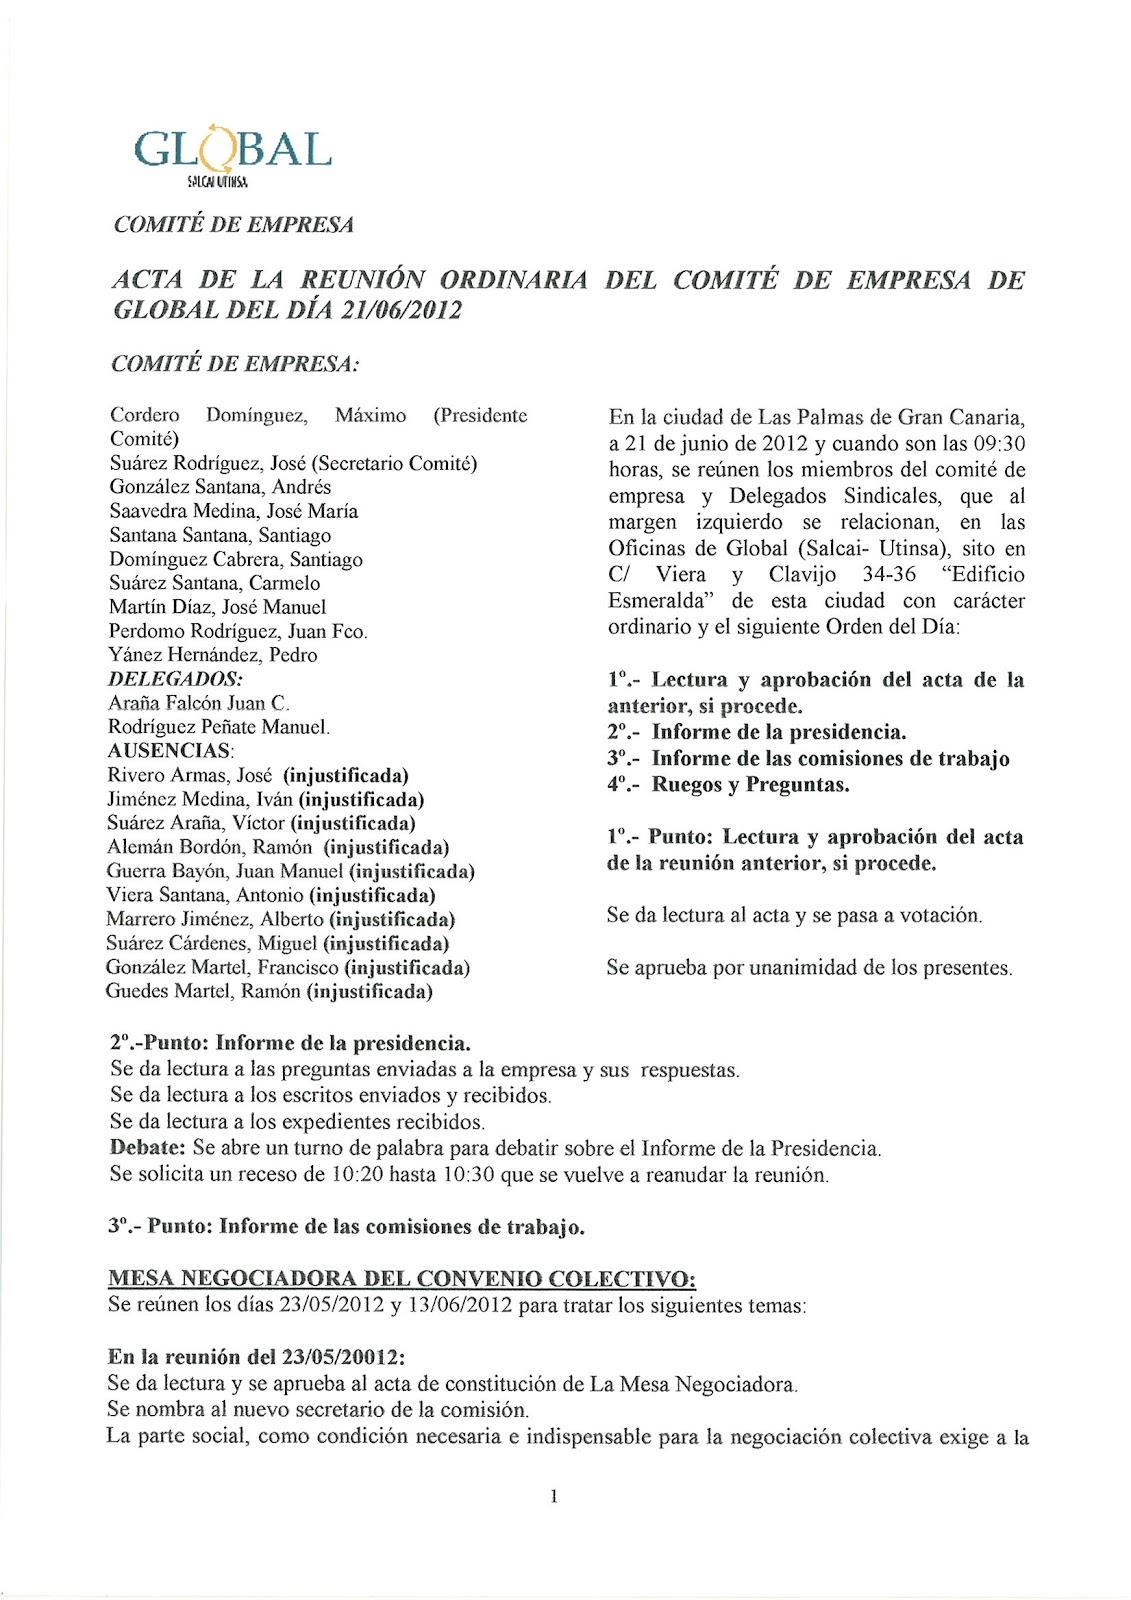 Comité de Empresa Global (Salcai-Utinsa): julio 2012